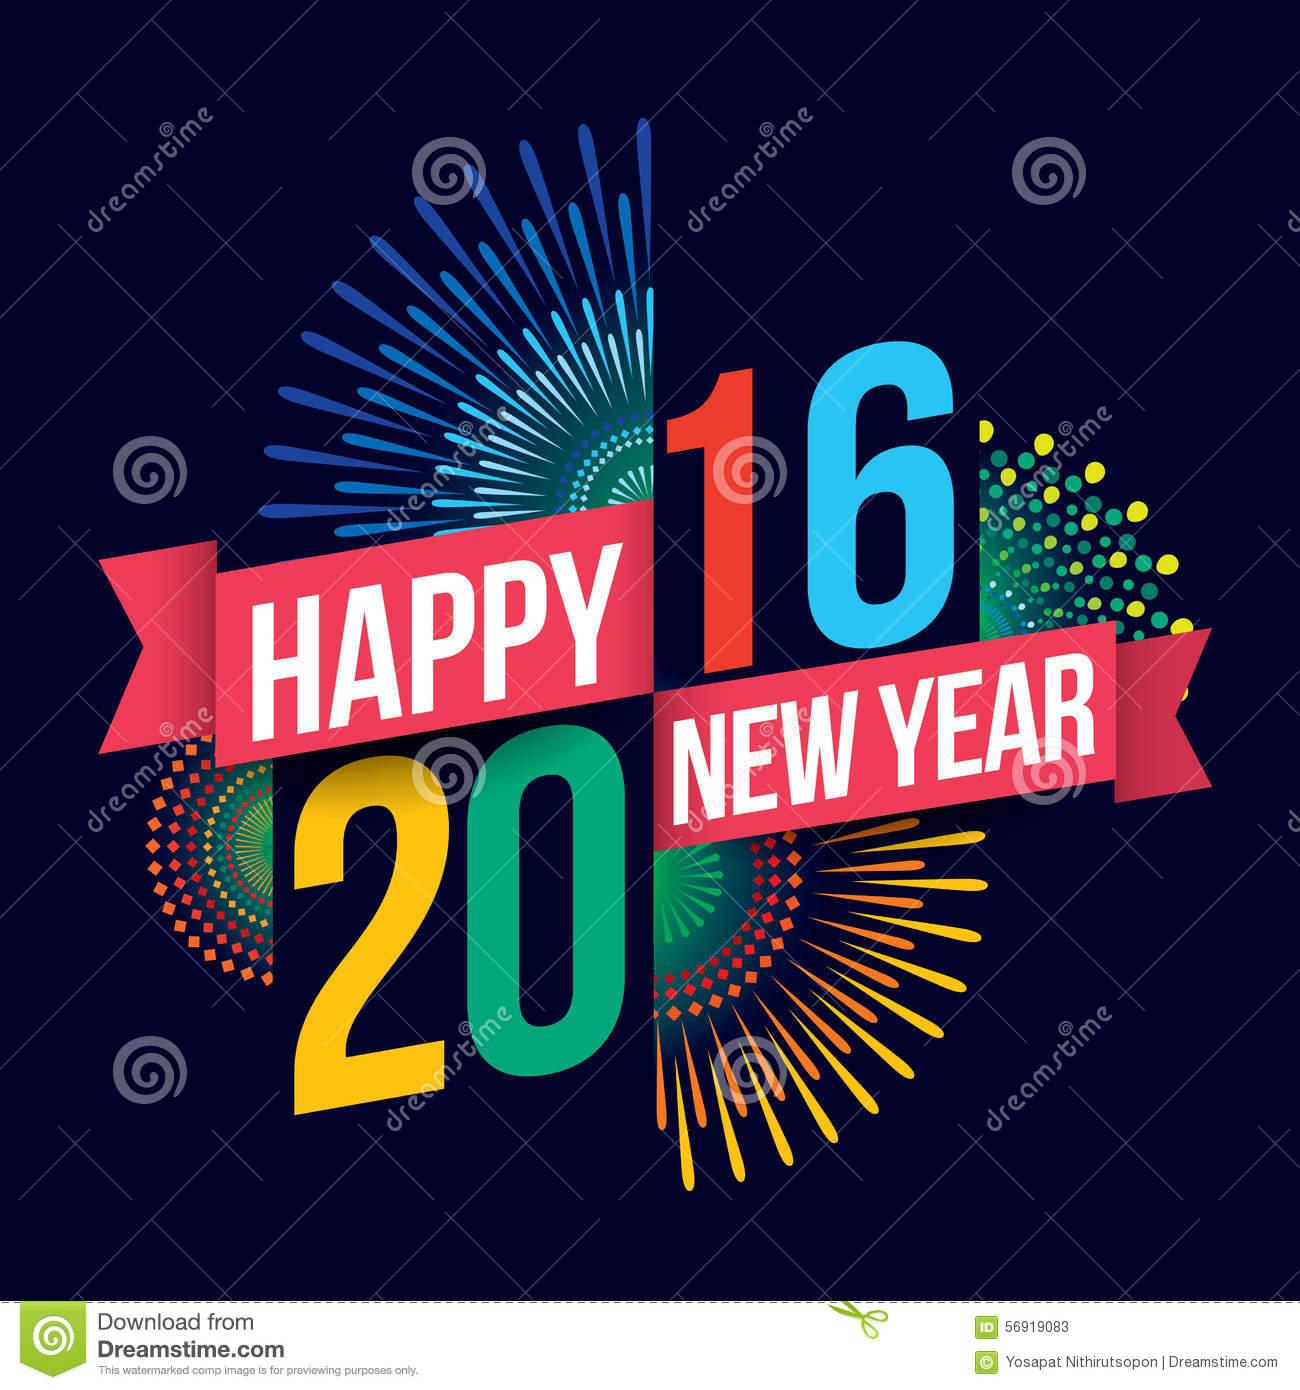 Happy New Year 2016 Stock Vector.